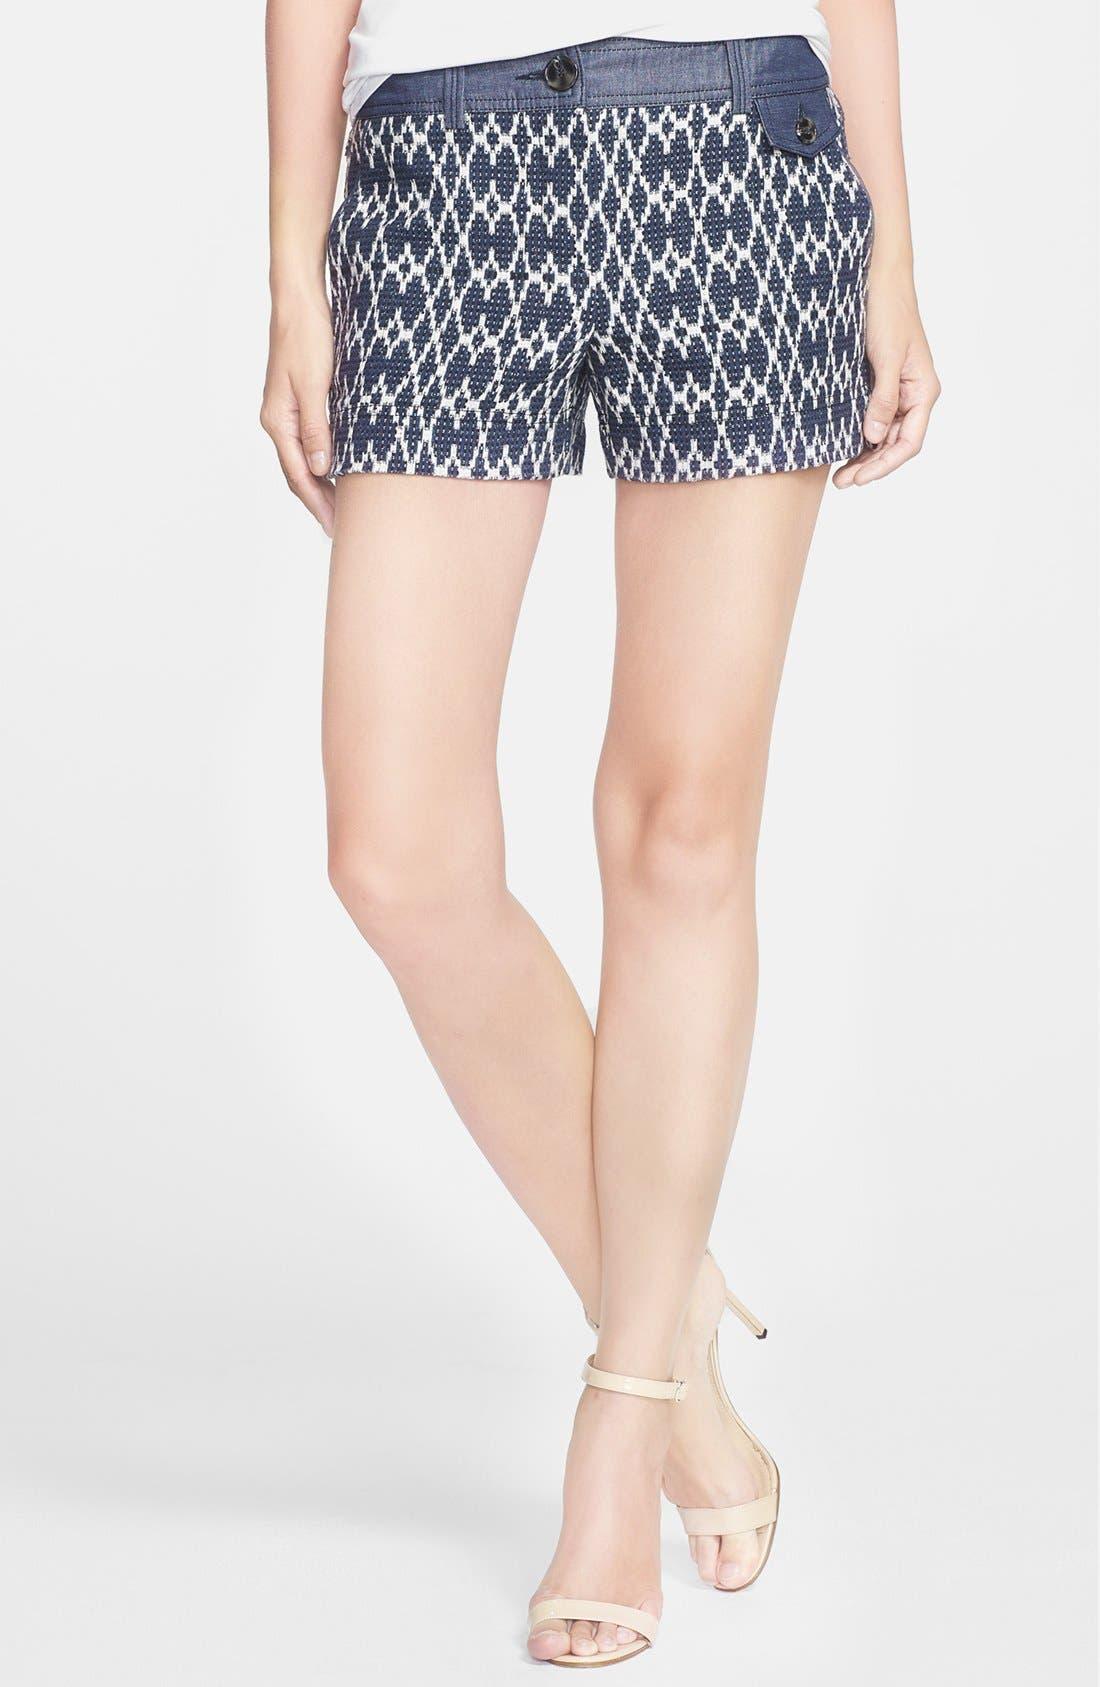 Alternate Image 1 Selected - Trina Turk 'Santiago' Cotton Blend Shorts